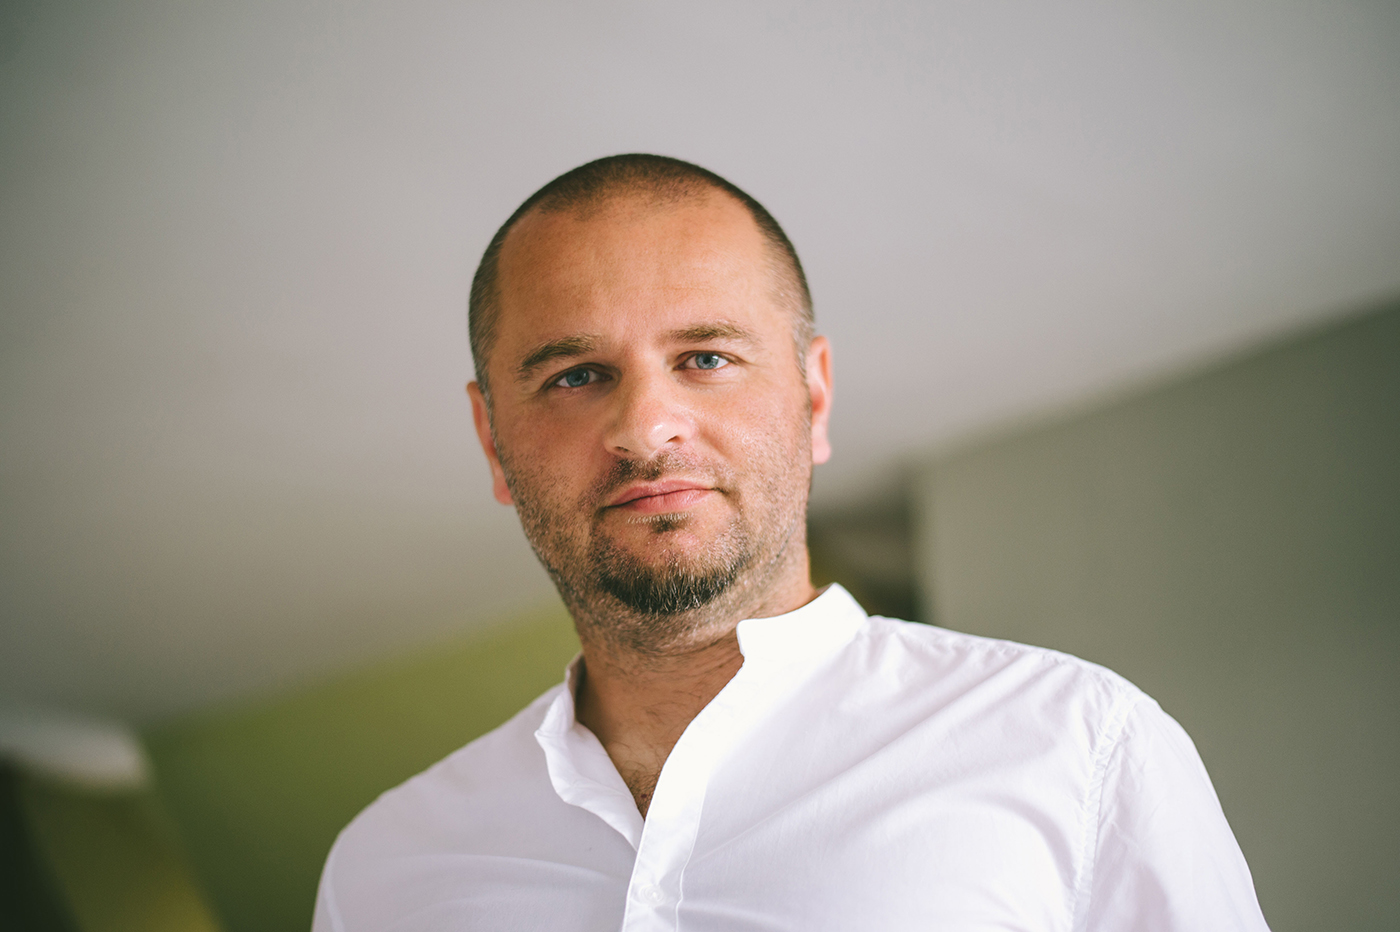 Petr Wagenknecht